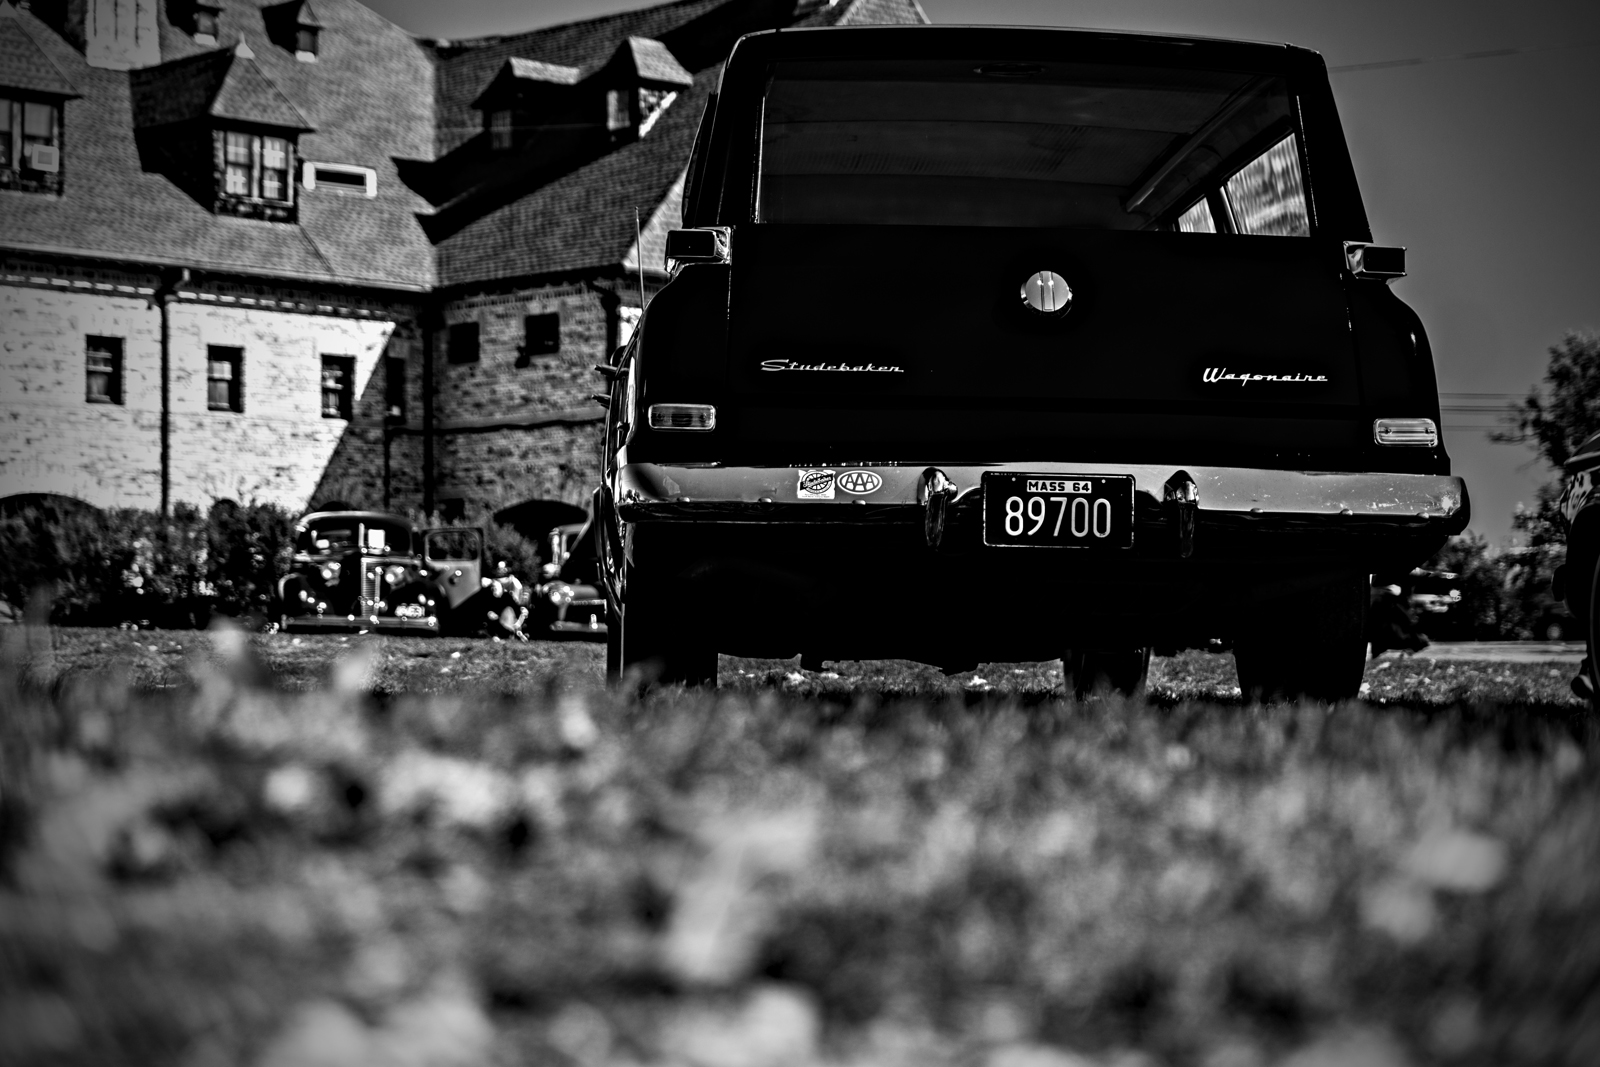 1965 Studebaker Wagonaire. Studebaker Day. Larz Anderson Auto Museum Brookline, MA